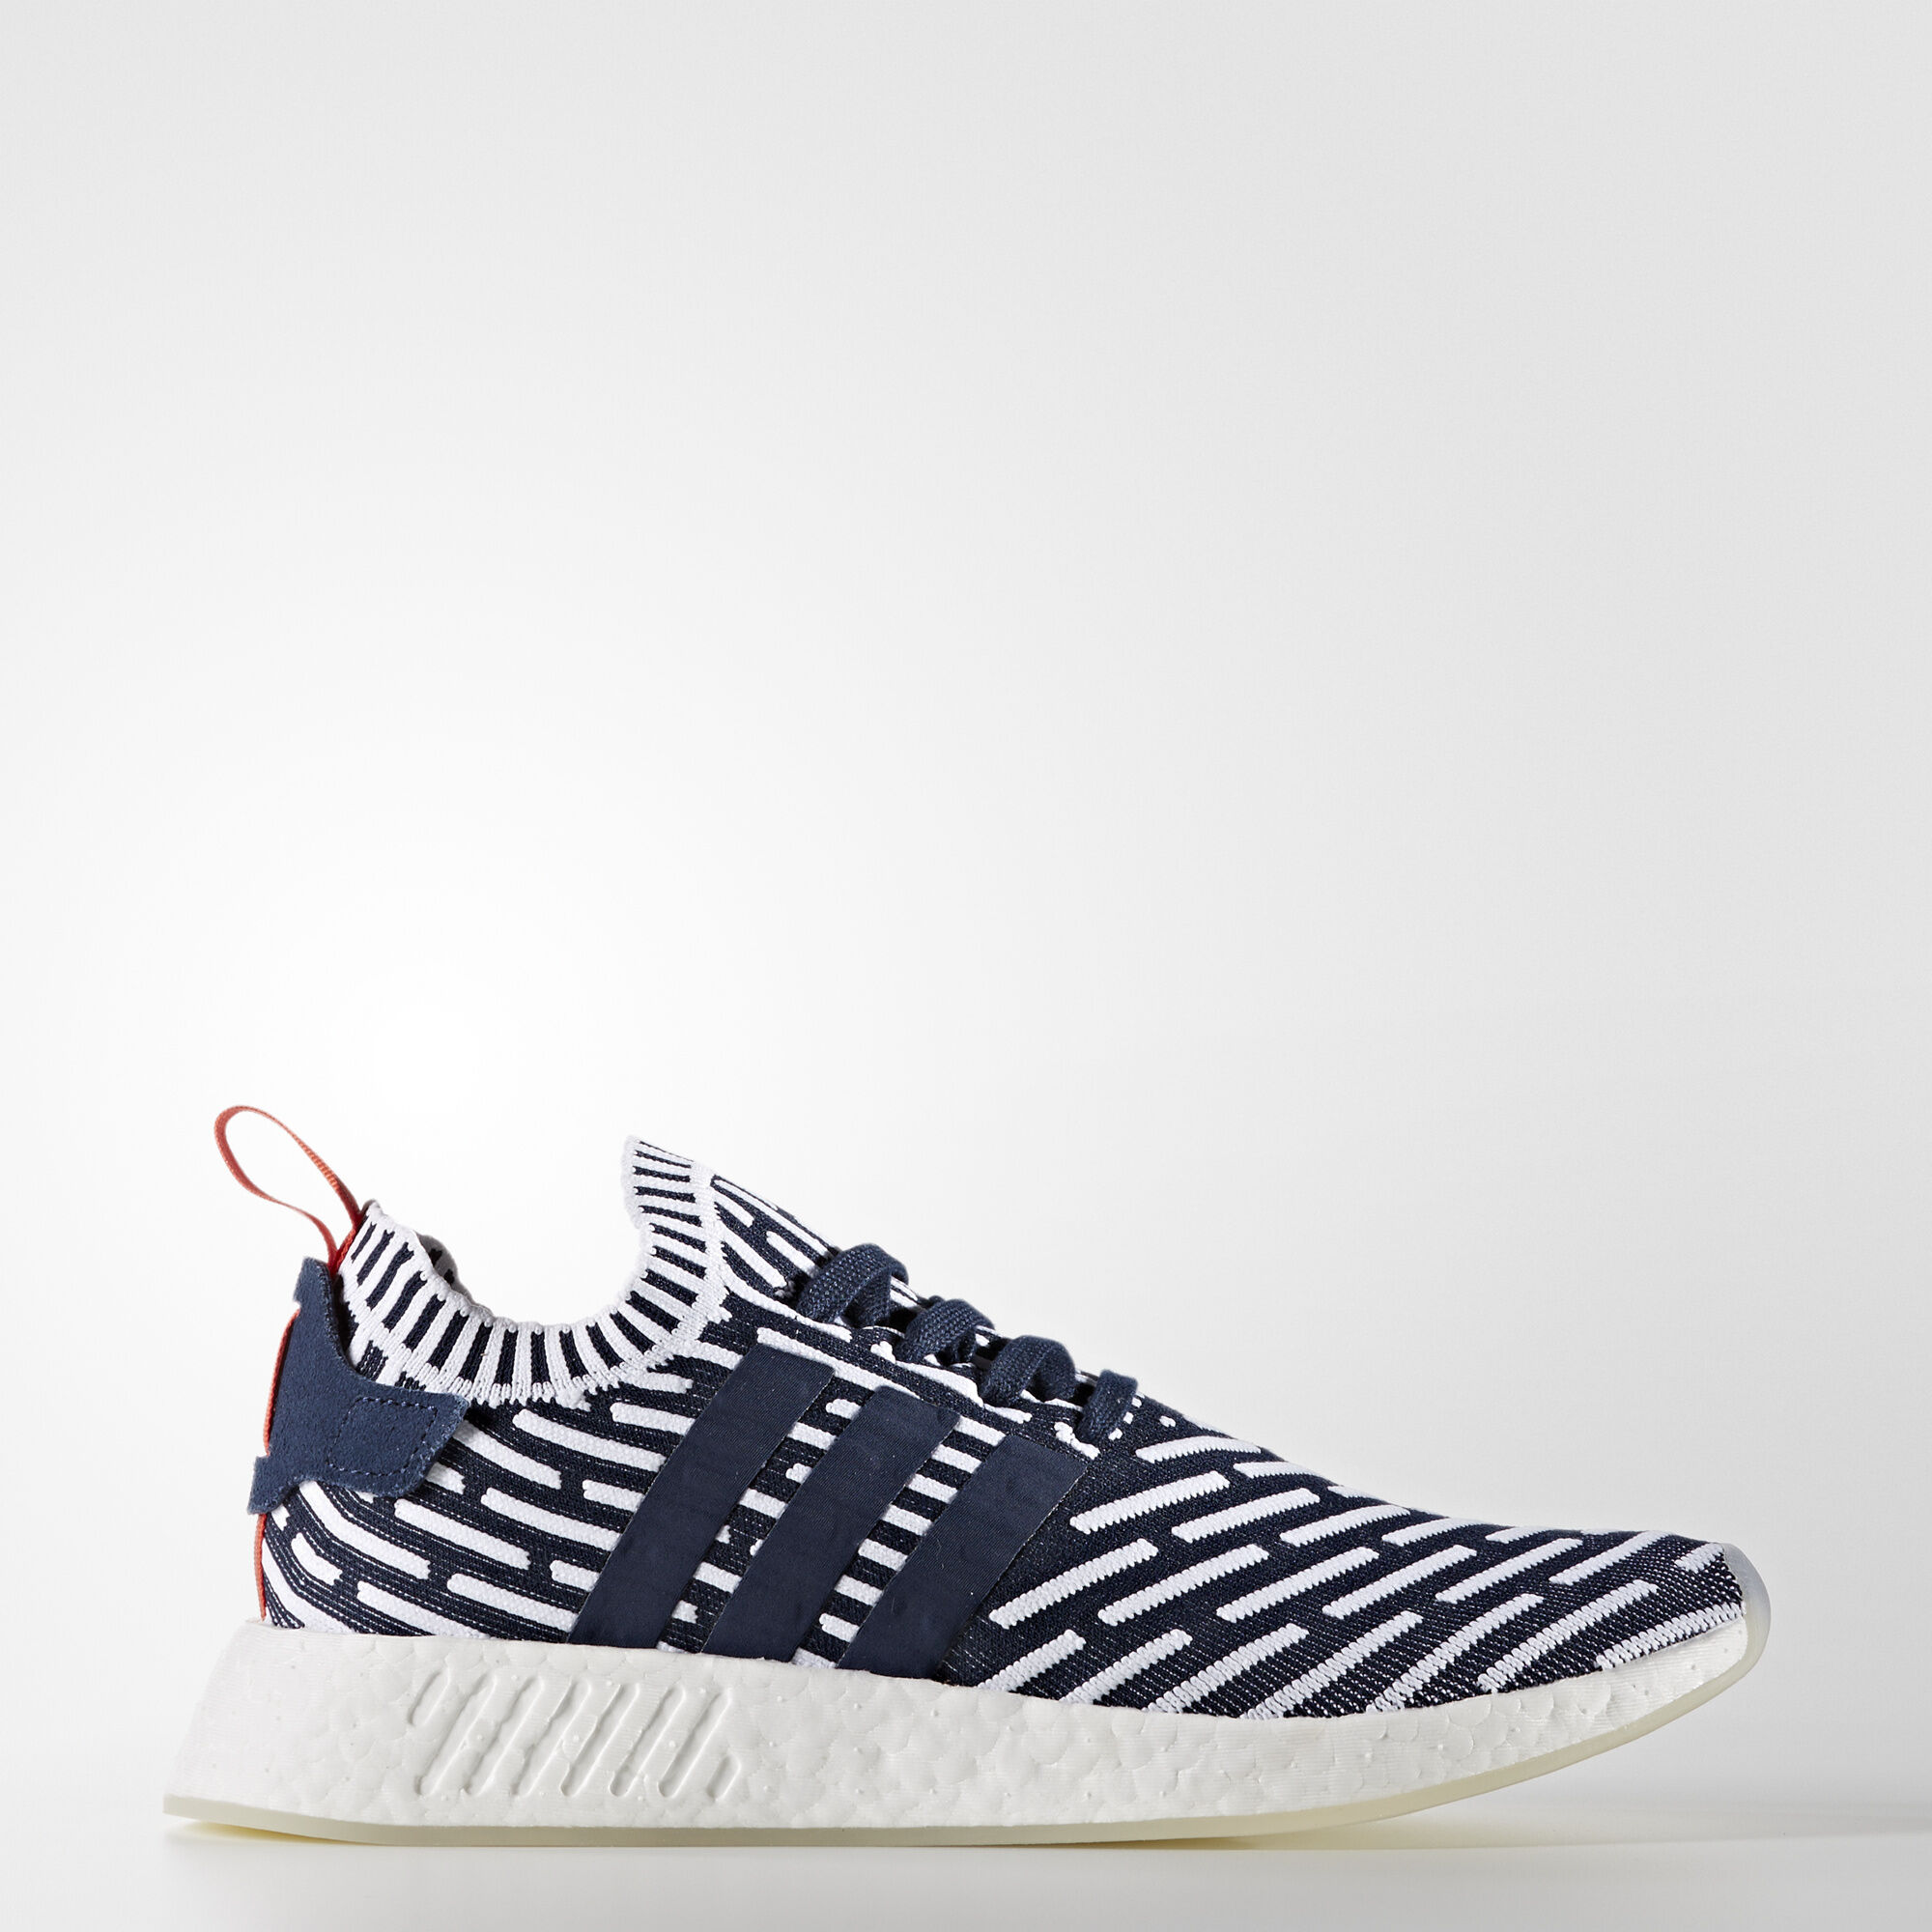 Adidas Schuhe Leopardenmuster